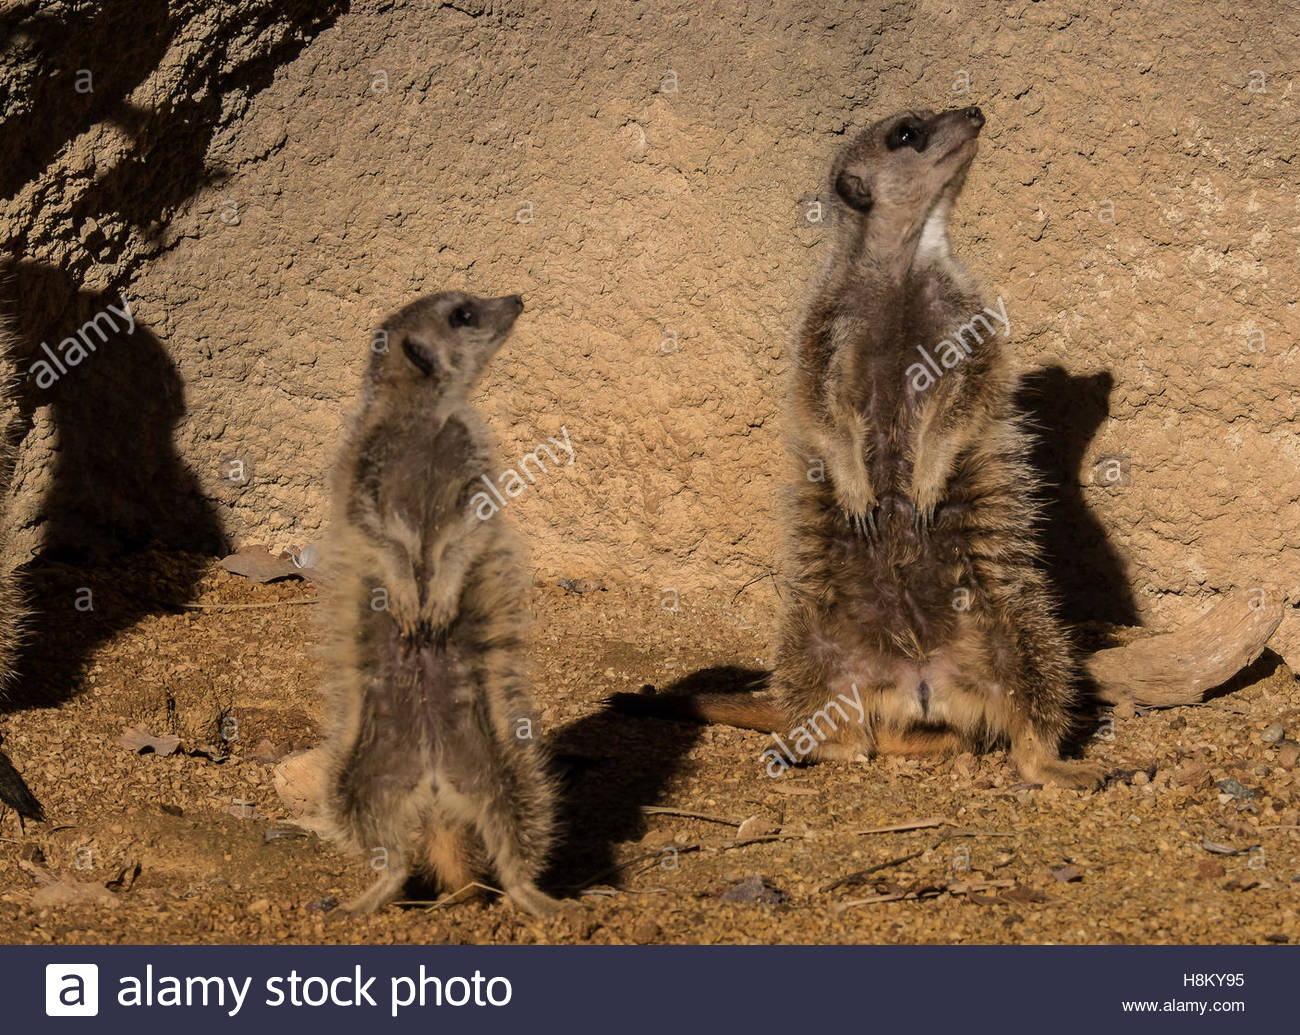 Turin, Italy. 12 november, 2016. ZOOM Zoo. Suricata suricatta The Meerkat (Suricata suricatta Schreber, 1776),Mongoose - Stock Image